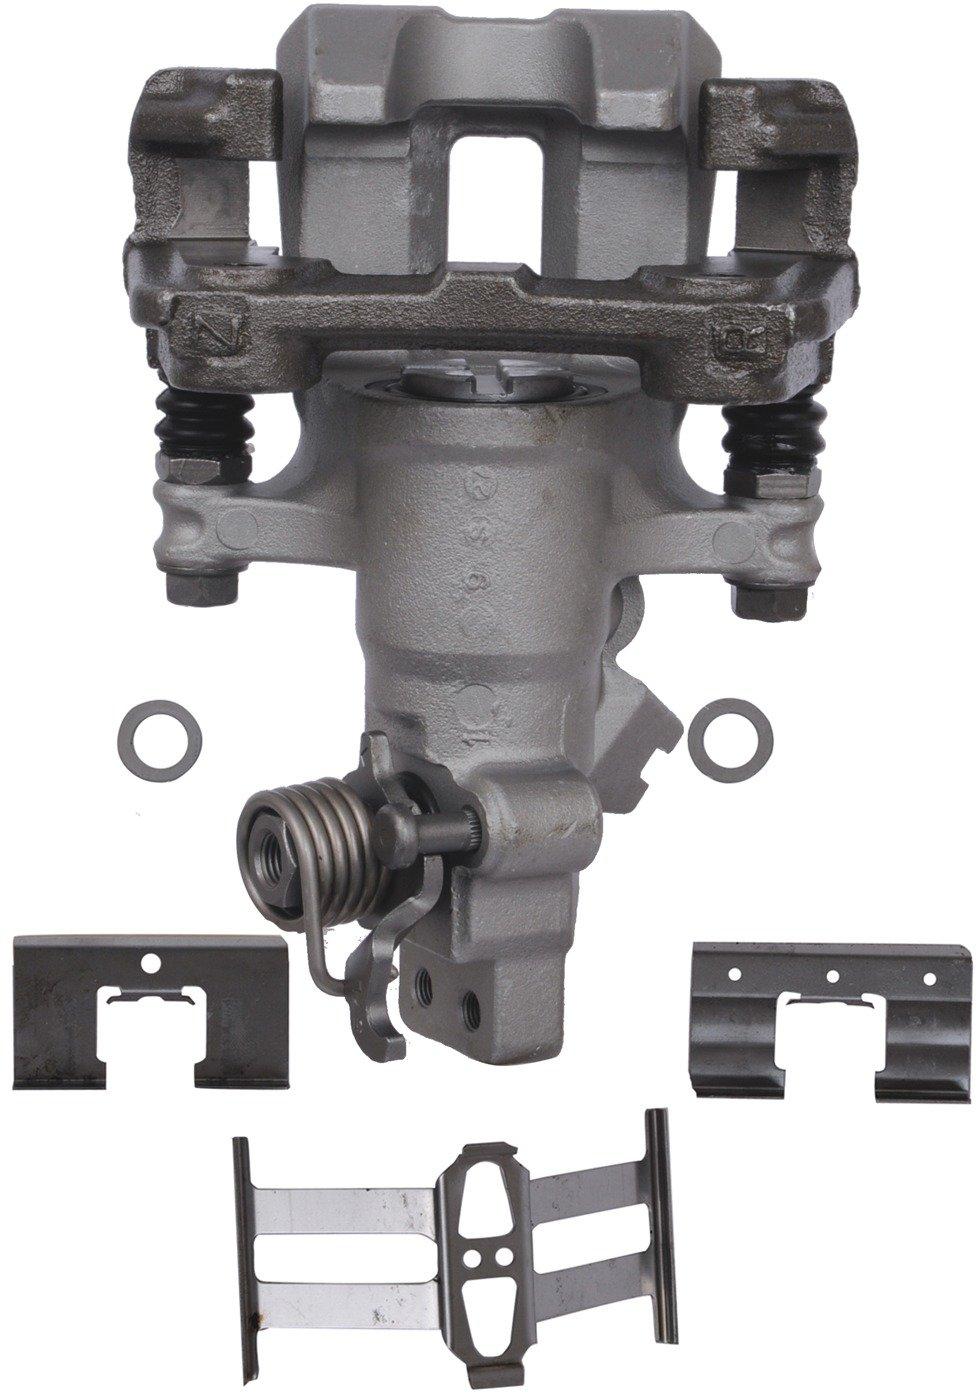 Remanufactured A1 Cardone 19-B6417 Unloaded Brake Caliper with Bracket